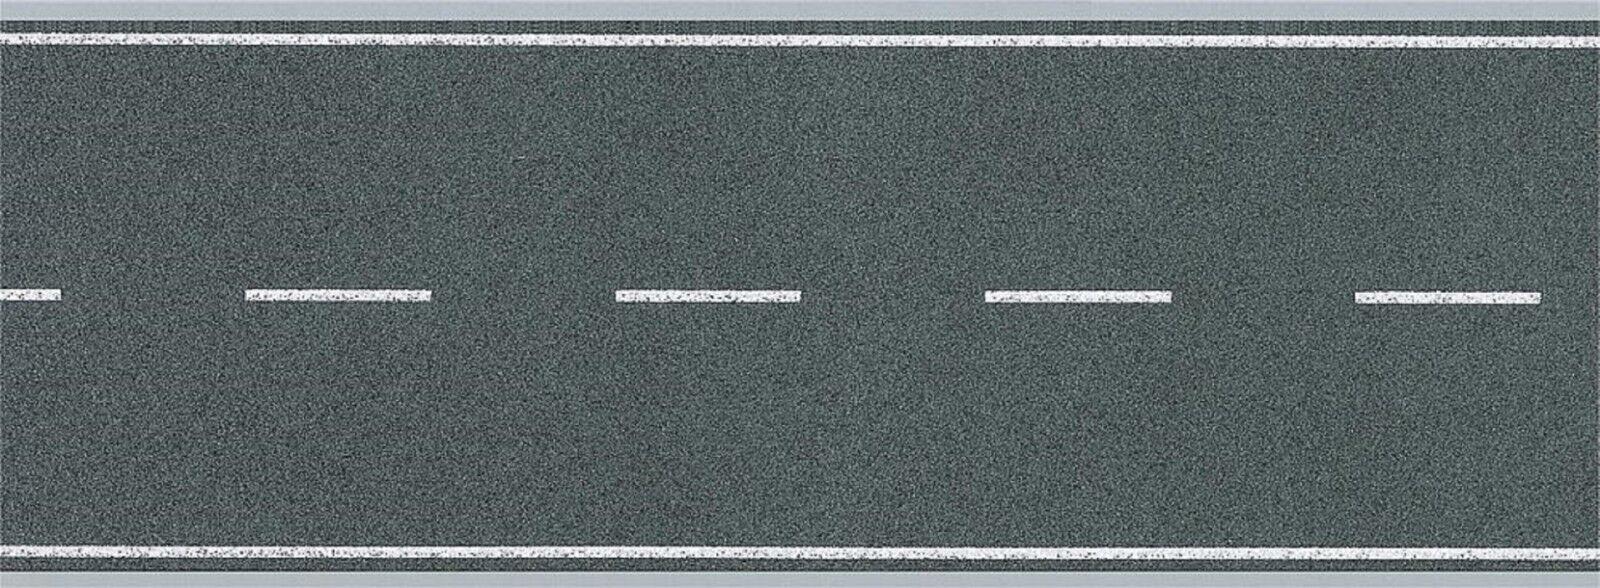 1 Meter Straße Asphalt m Linien Heki Folie  Spur N 6562  #E